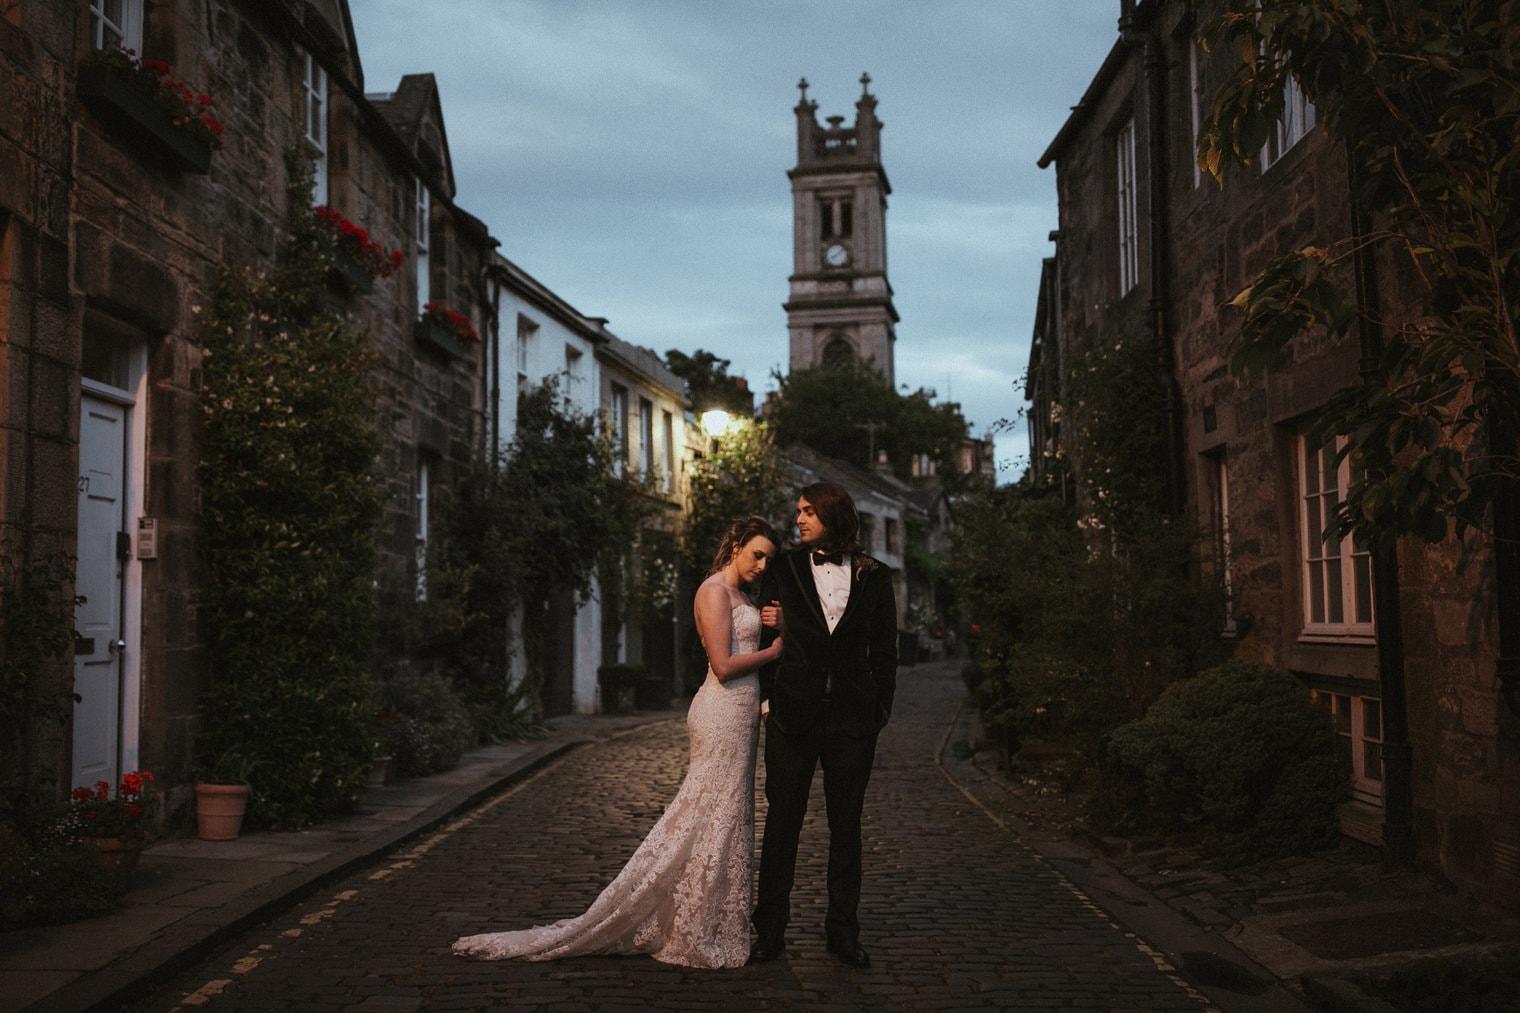 Bride and groom in Edinburgh after their wedding